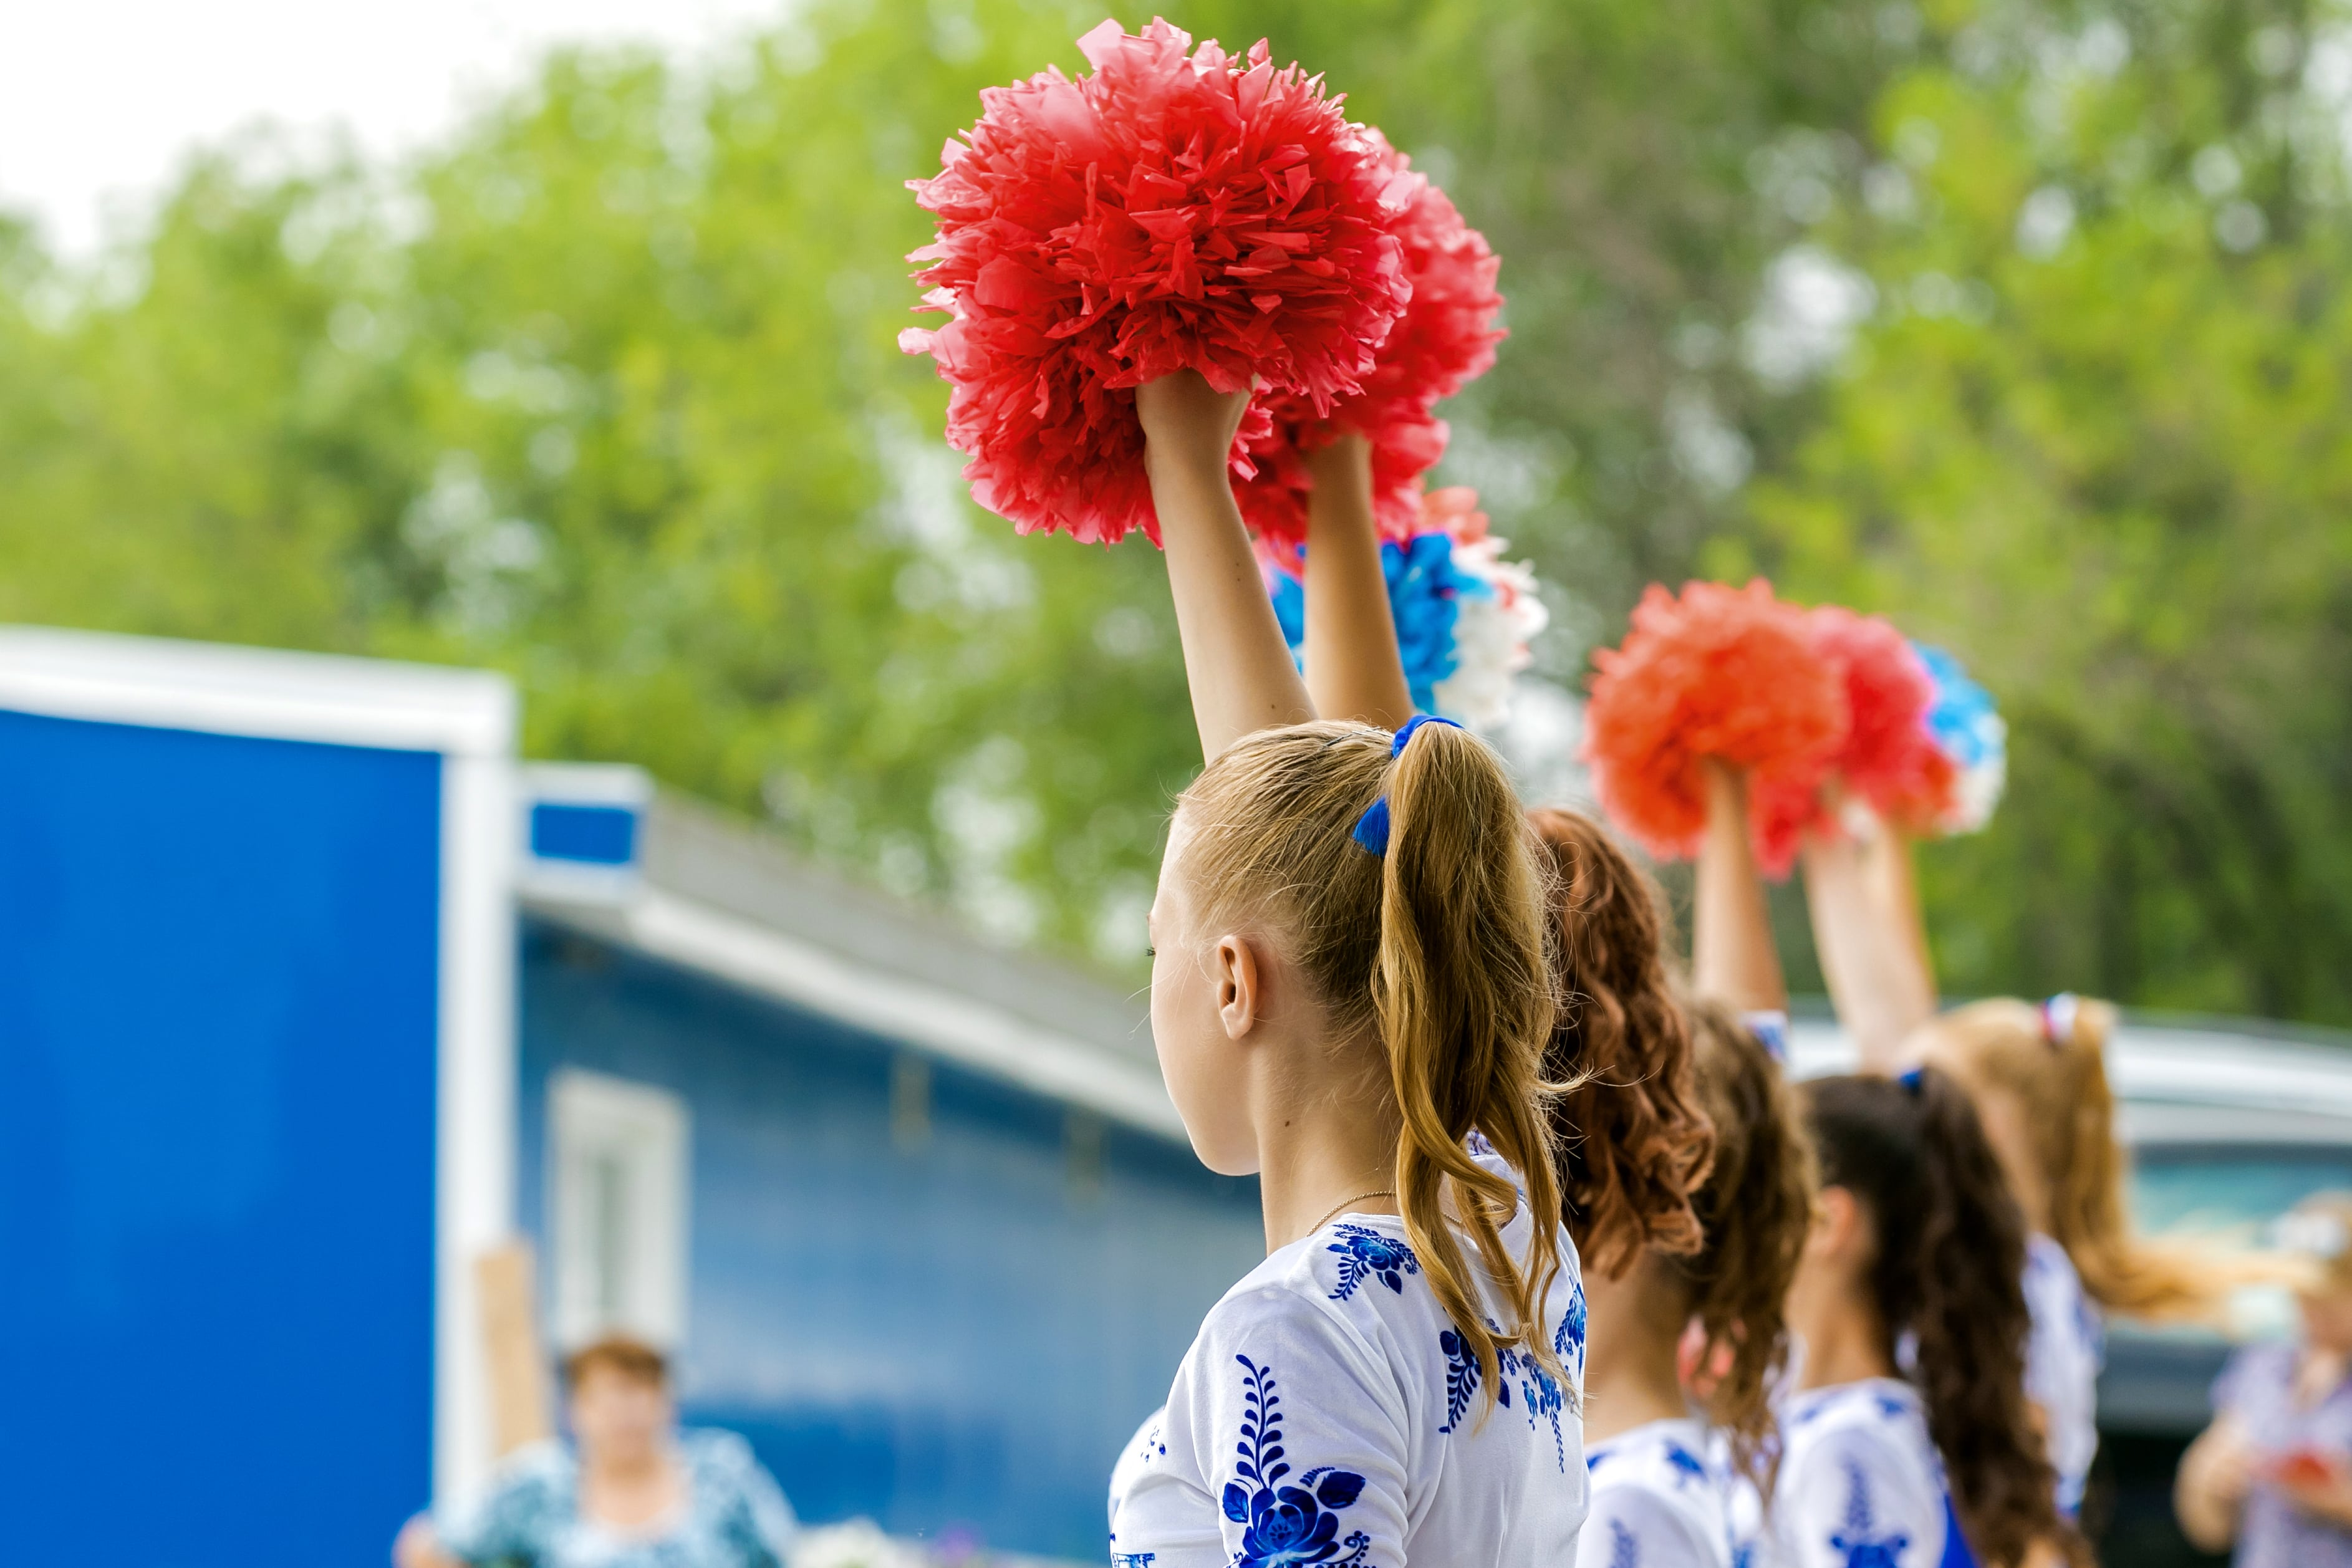 Group of girls holding red pom poms